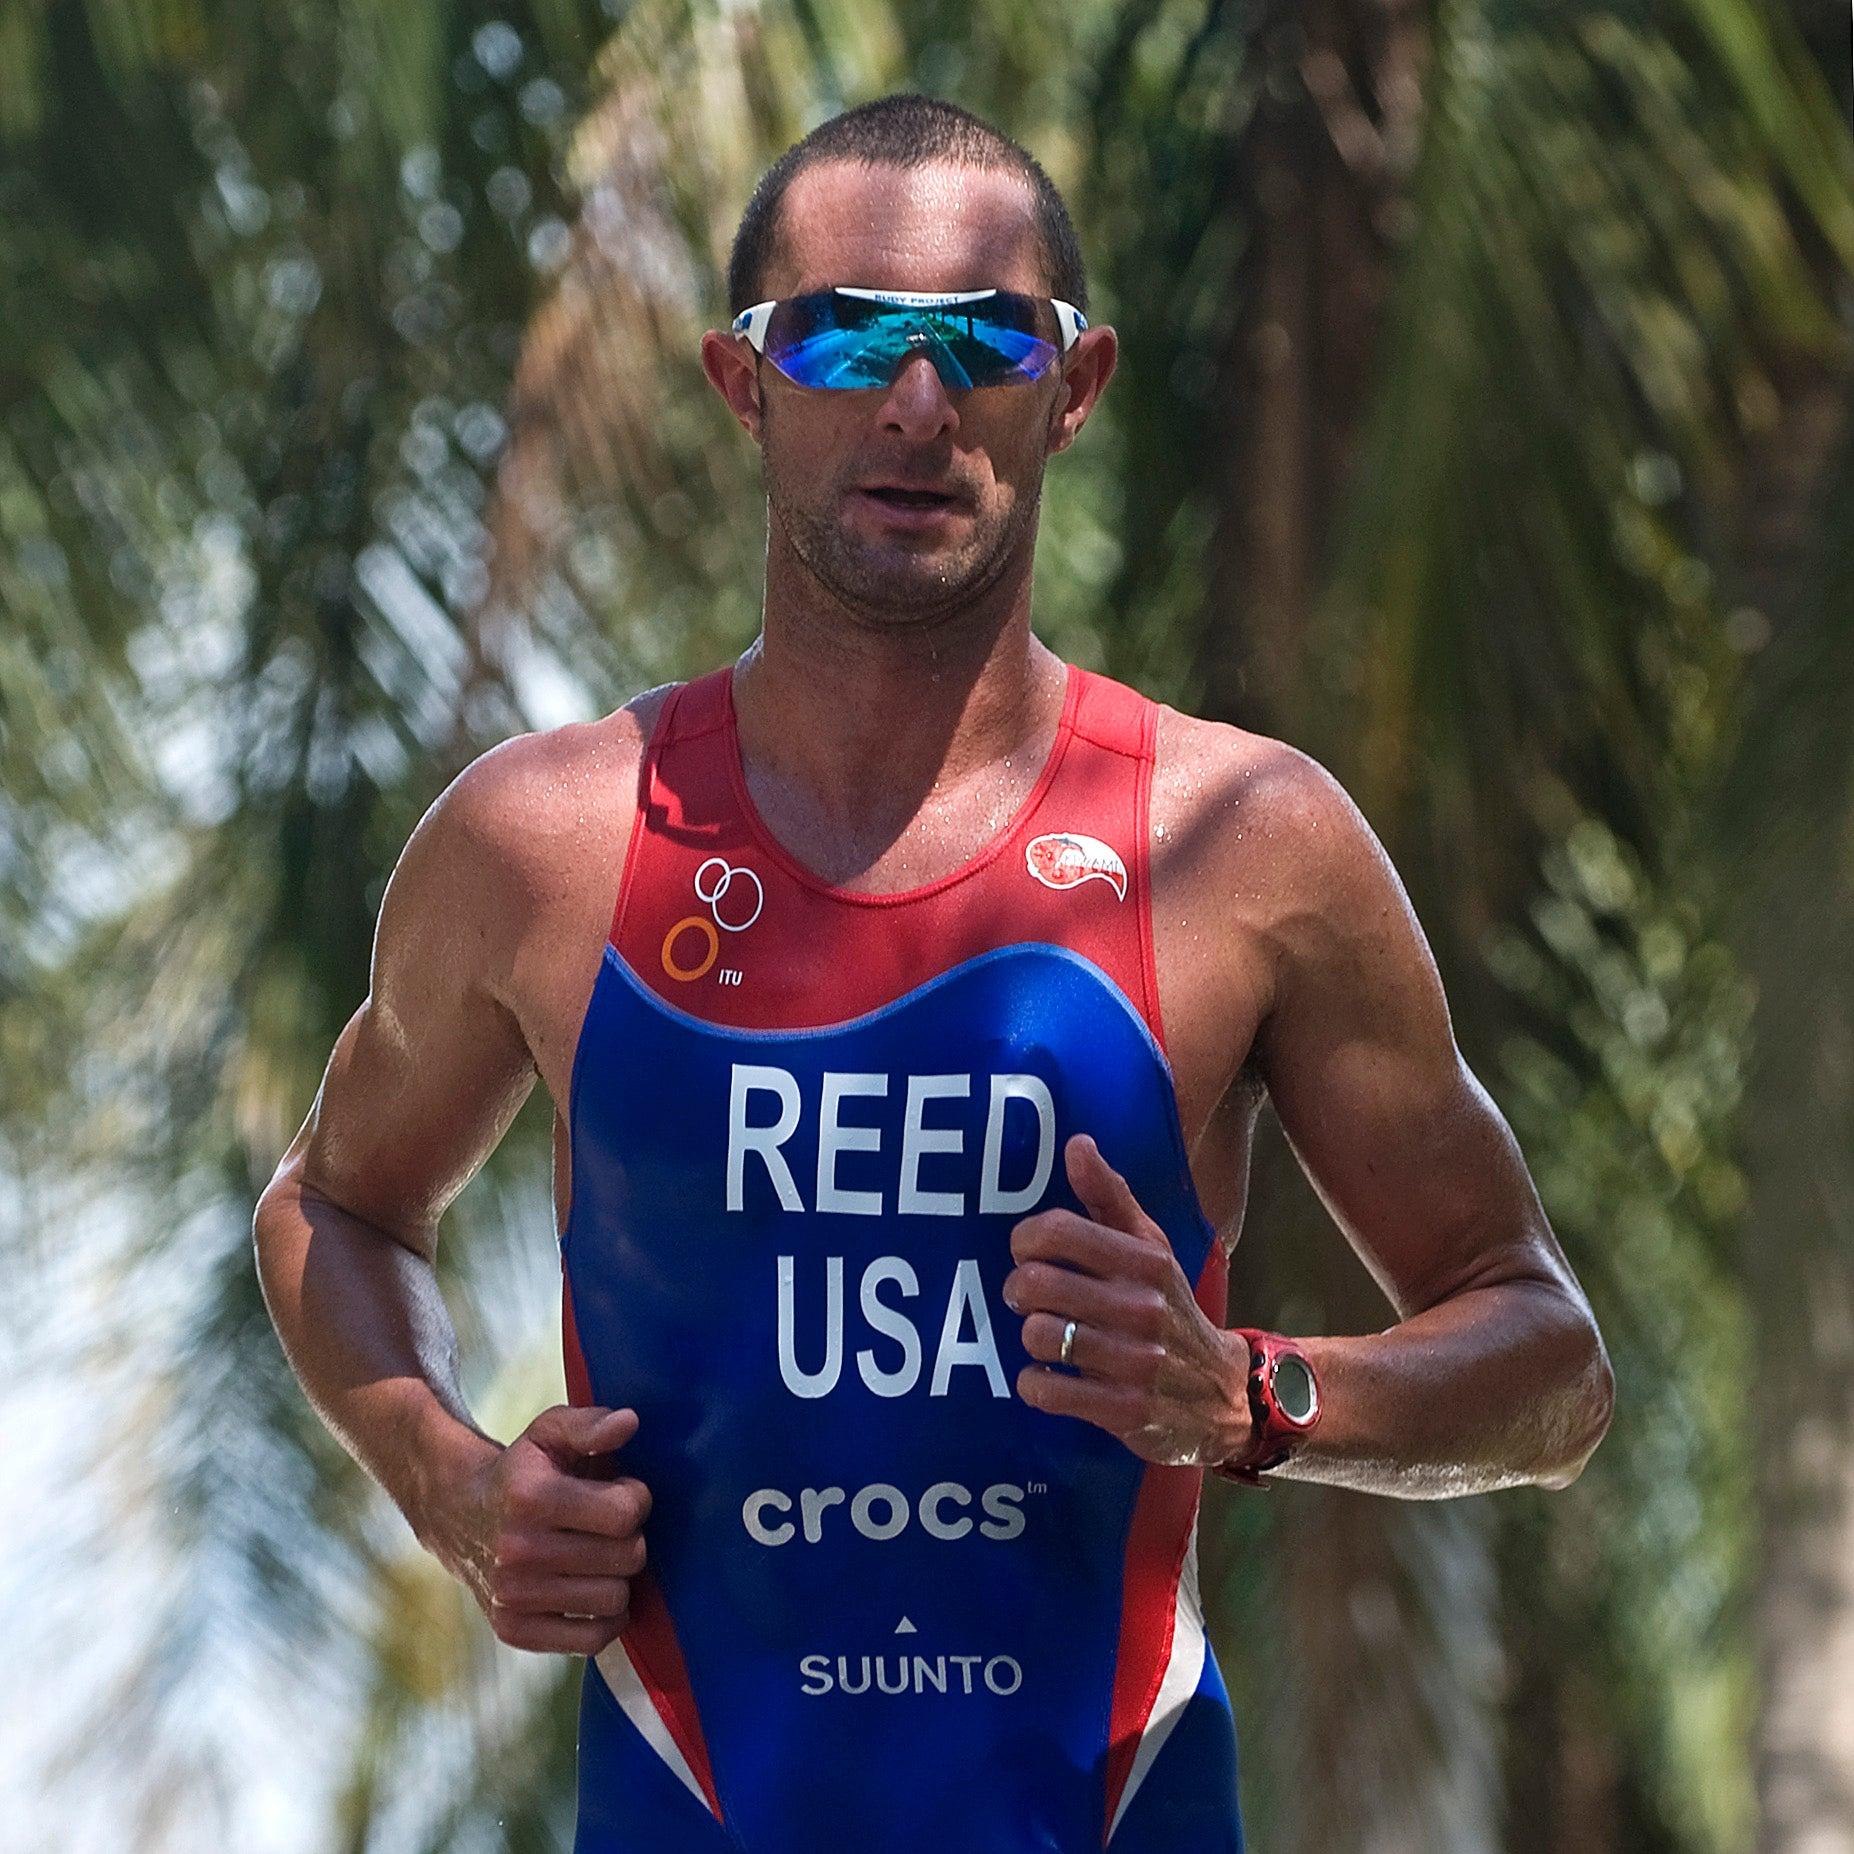 Matt Reed spent 2009 competing in both ITU and non-drafting triathlons. Photo: Triathlon.org